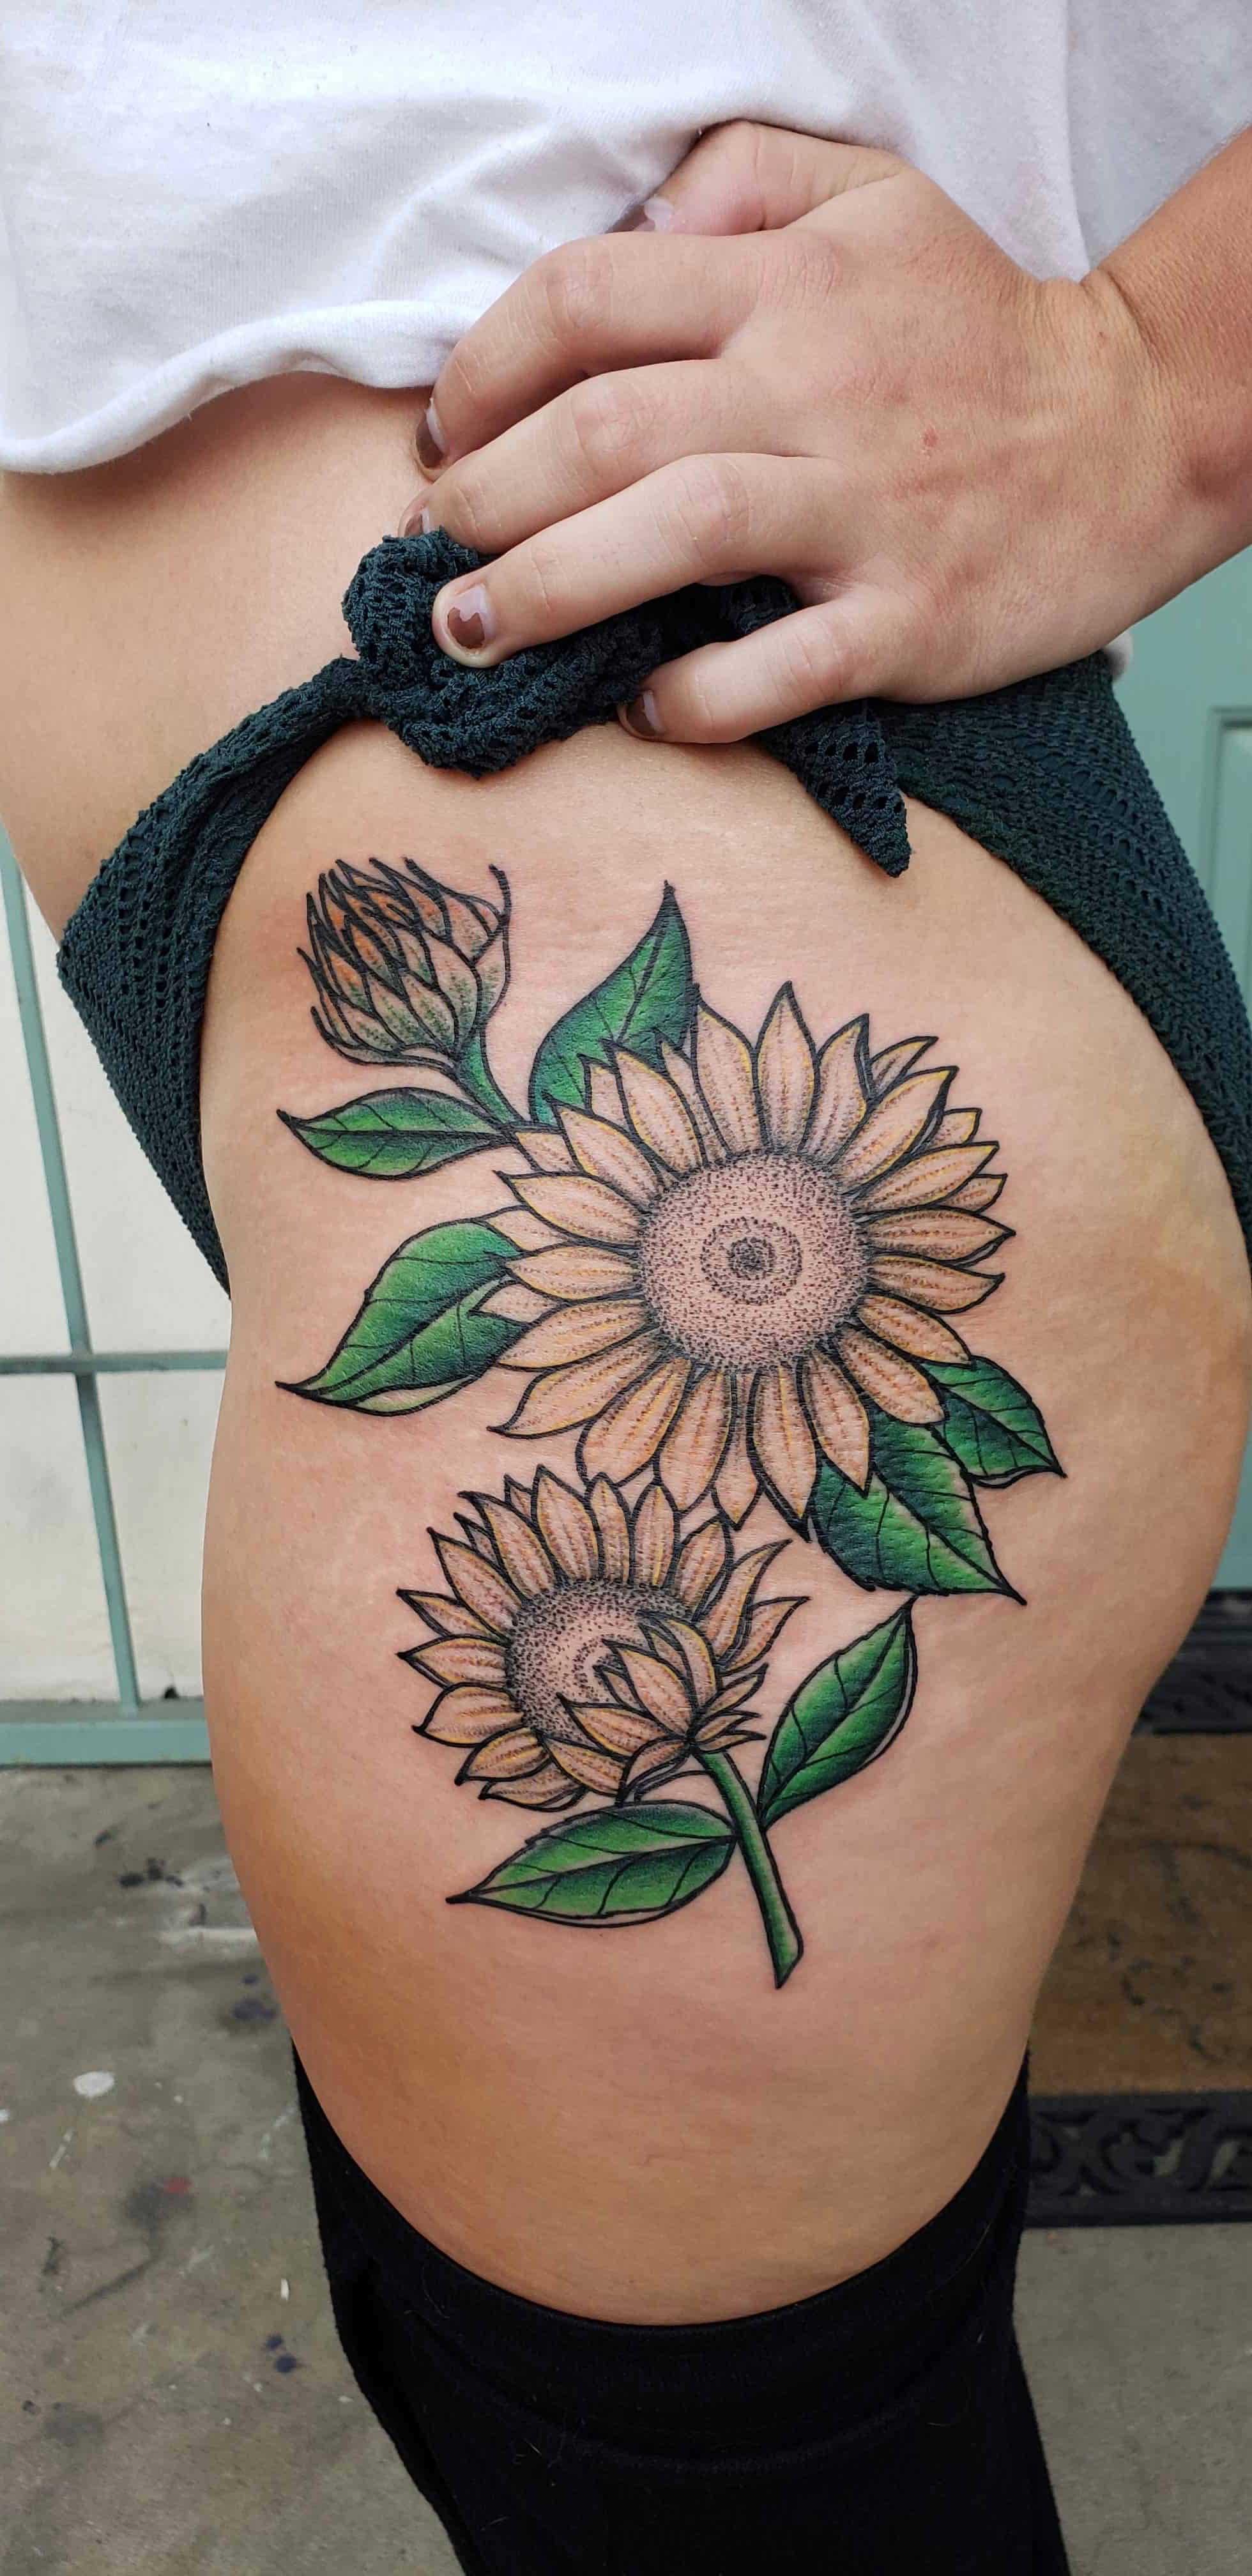 sunflower tattoo on the hip